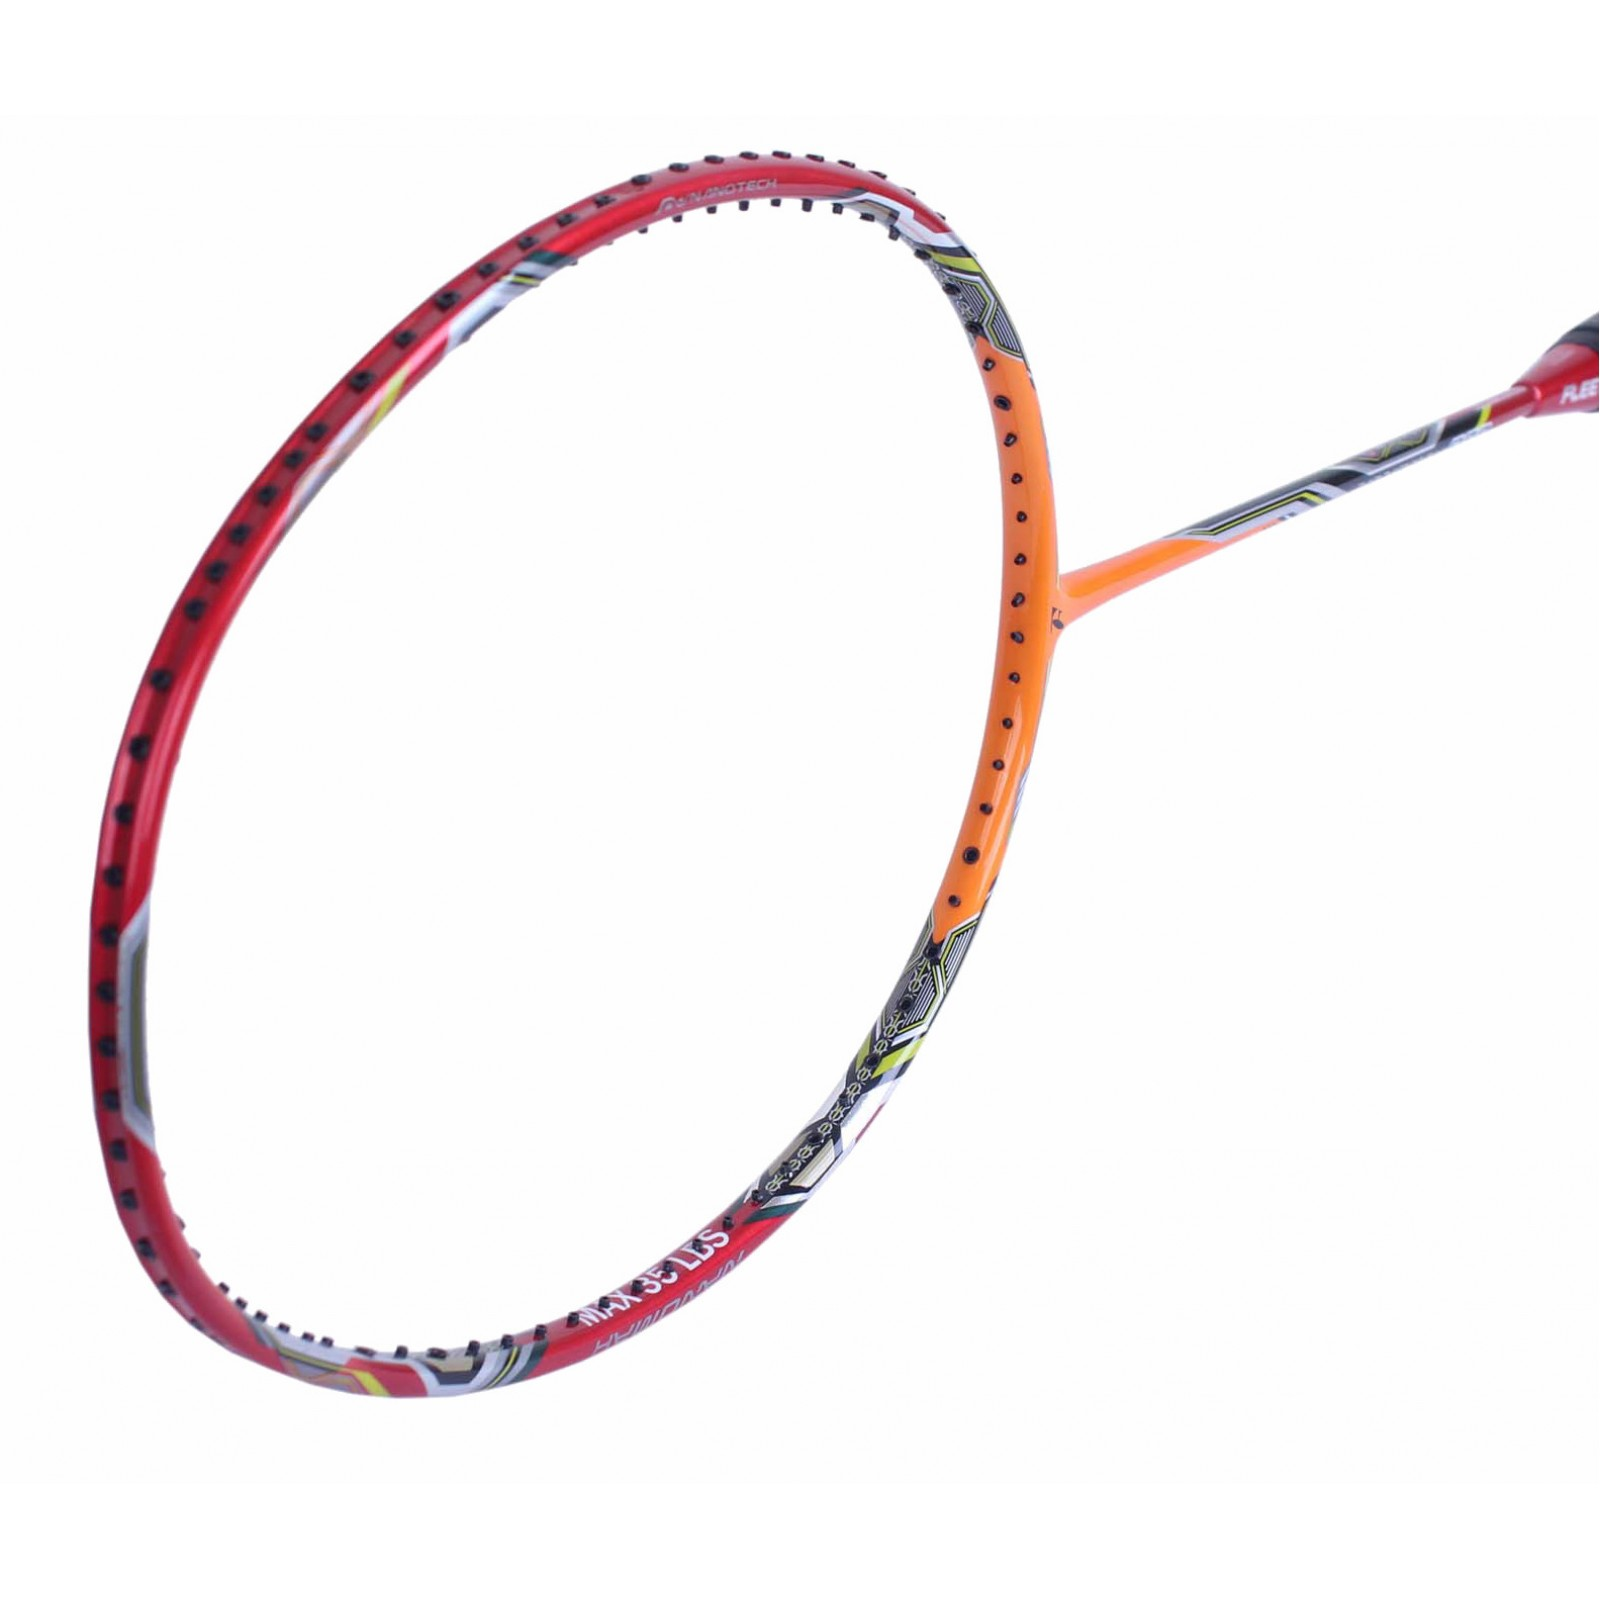 ~ Out of stock Fleet NanoMax 900 Orange Badminton Racket (3U)